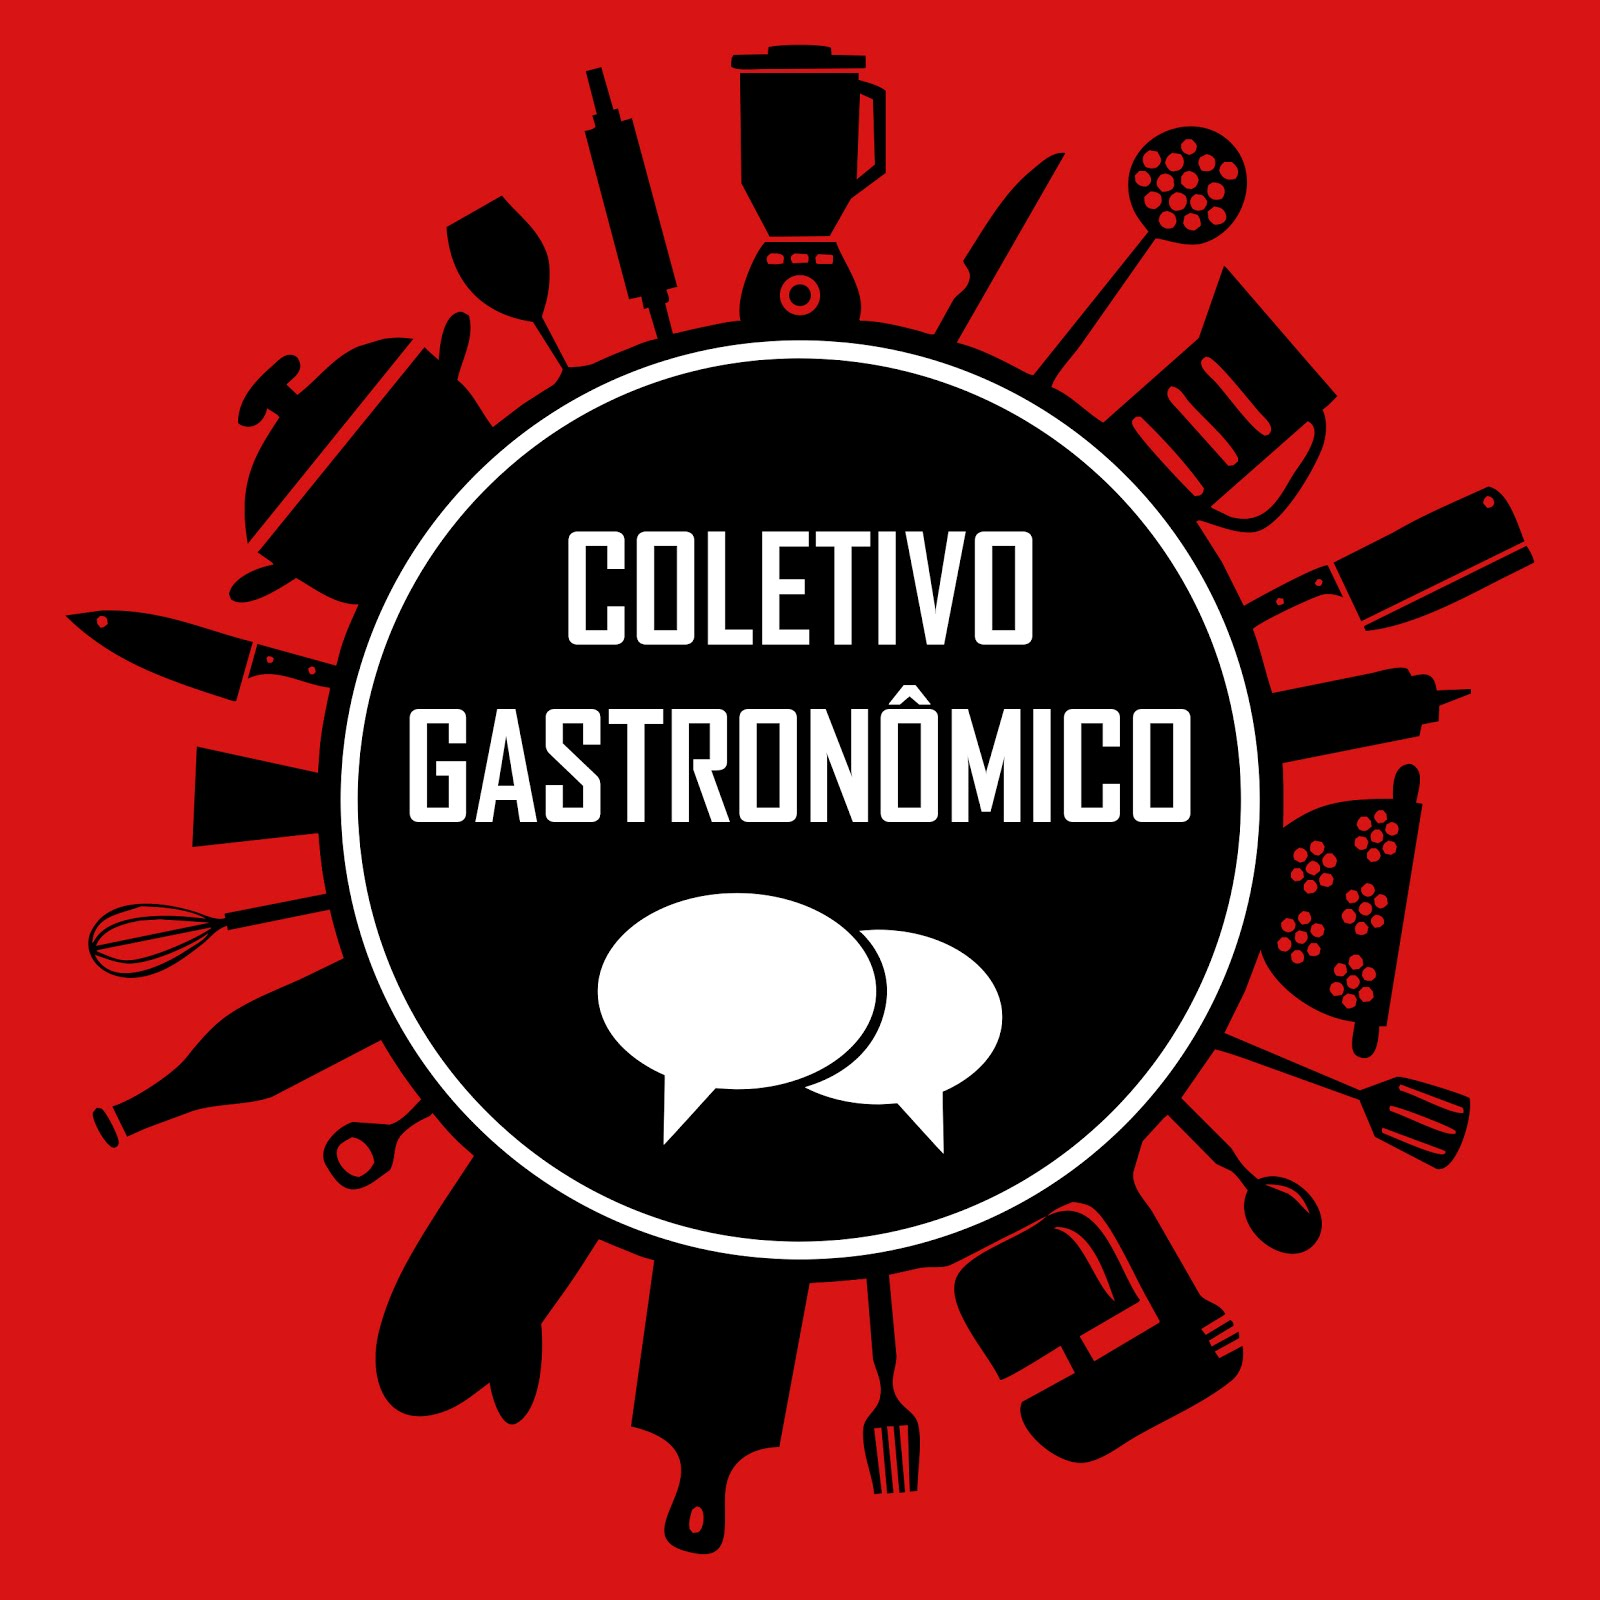 #coletivogastronômico